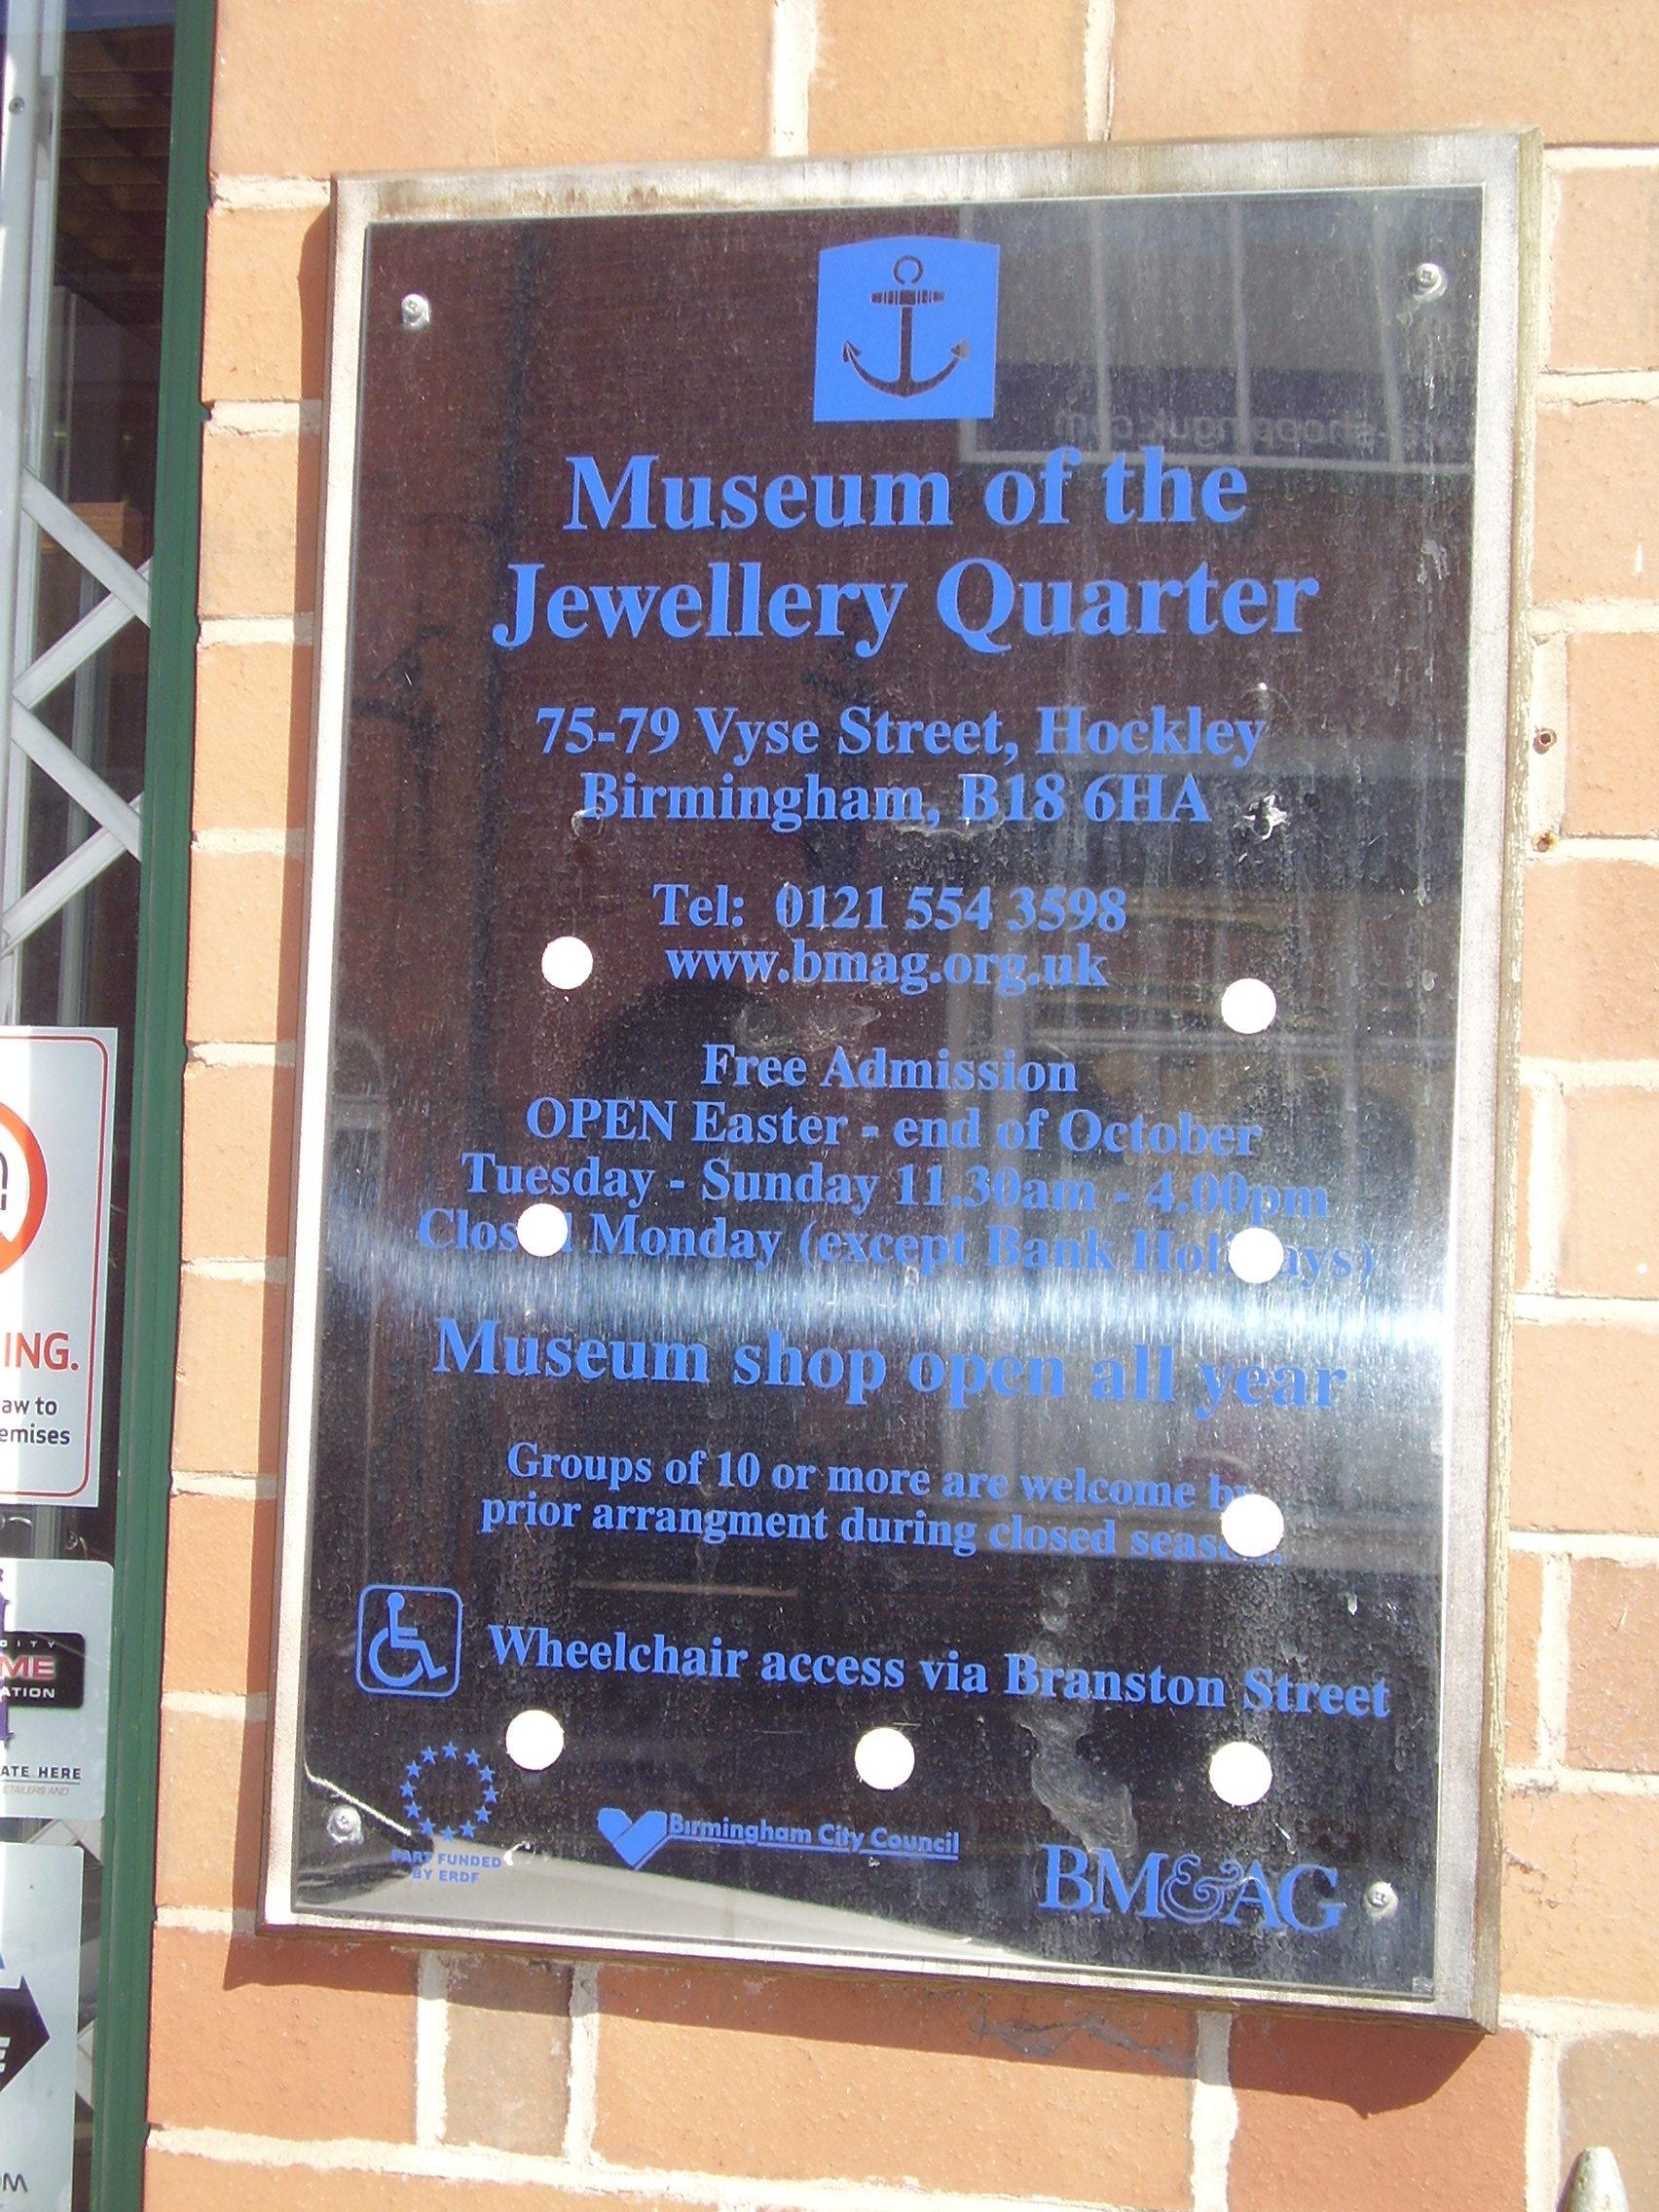 useum of the Jewellery Quarter Silver plaque 75-80 Vyse St, Birmingham B18 6HA, UK 2008